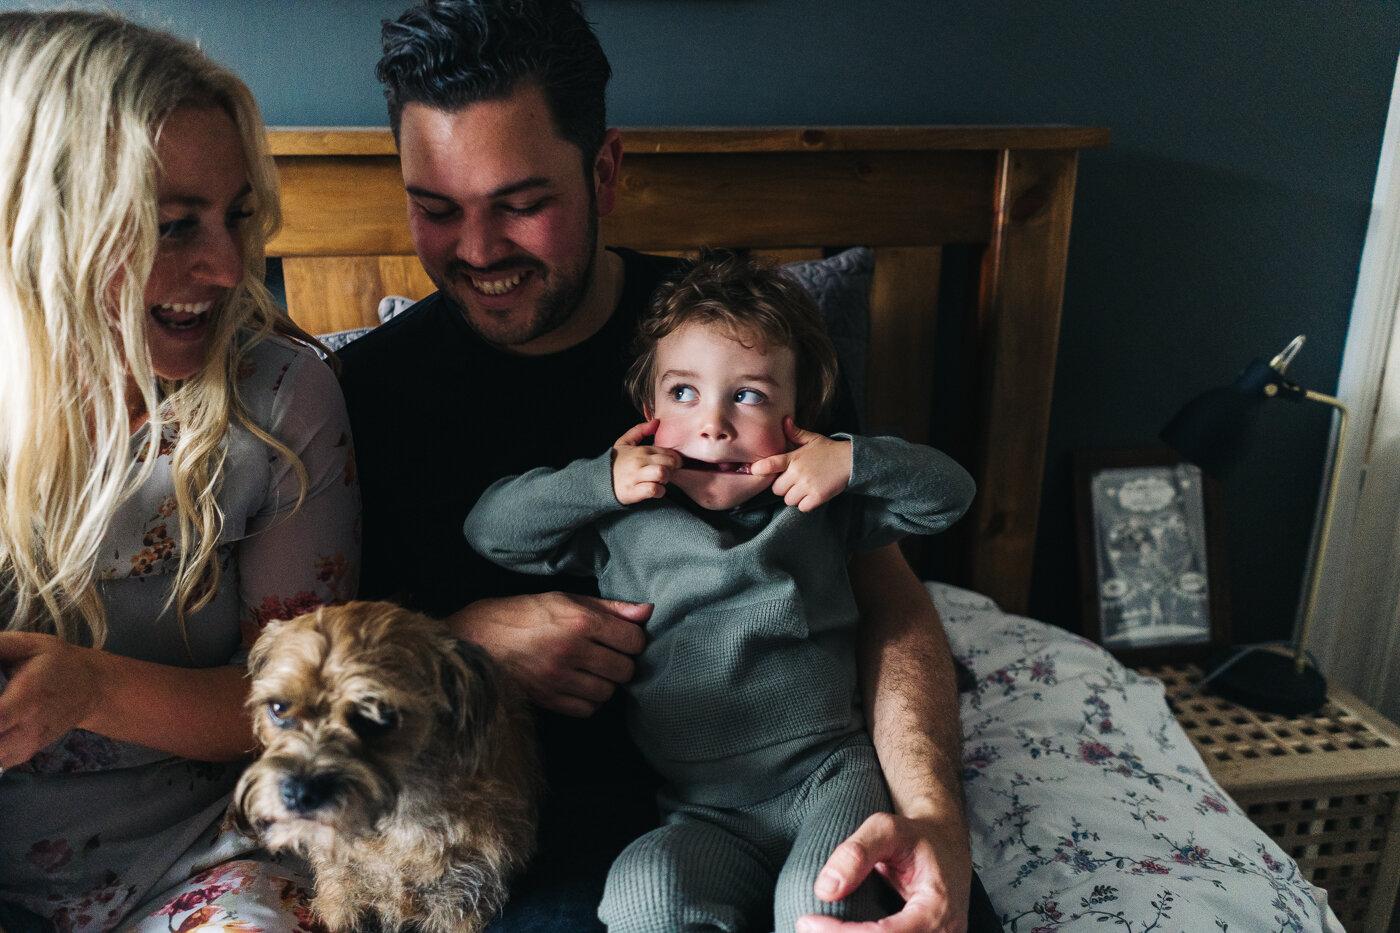 family-photography-teesside-north-yorkshire-newborn-baby-family-shoot-0013.jpg